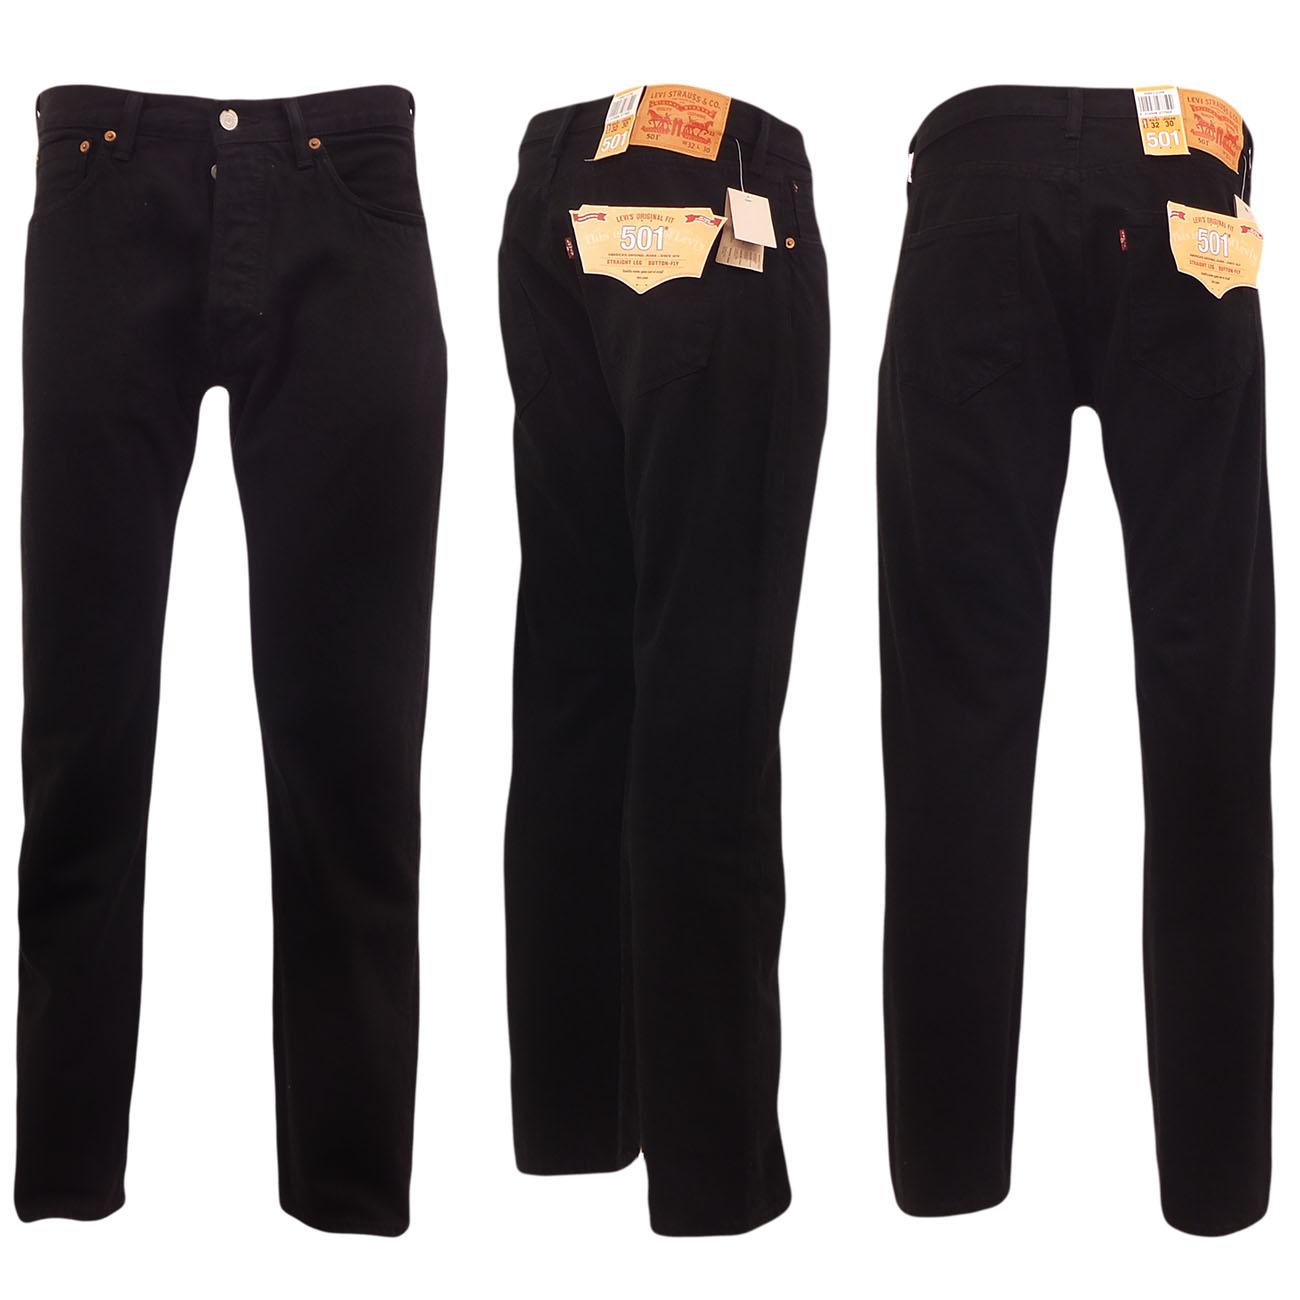 Mens Levi's Straight Original Levi Fit Jeans New Denim Strauss 501 xHBICwE